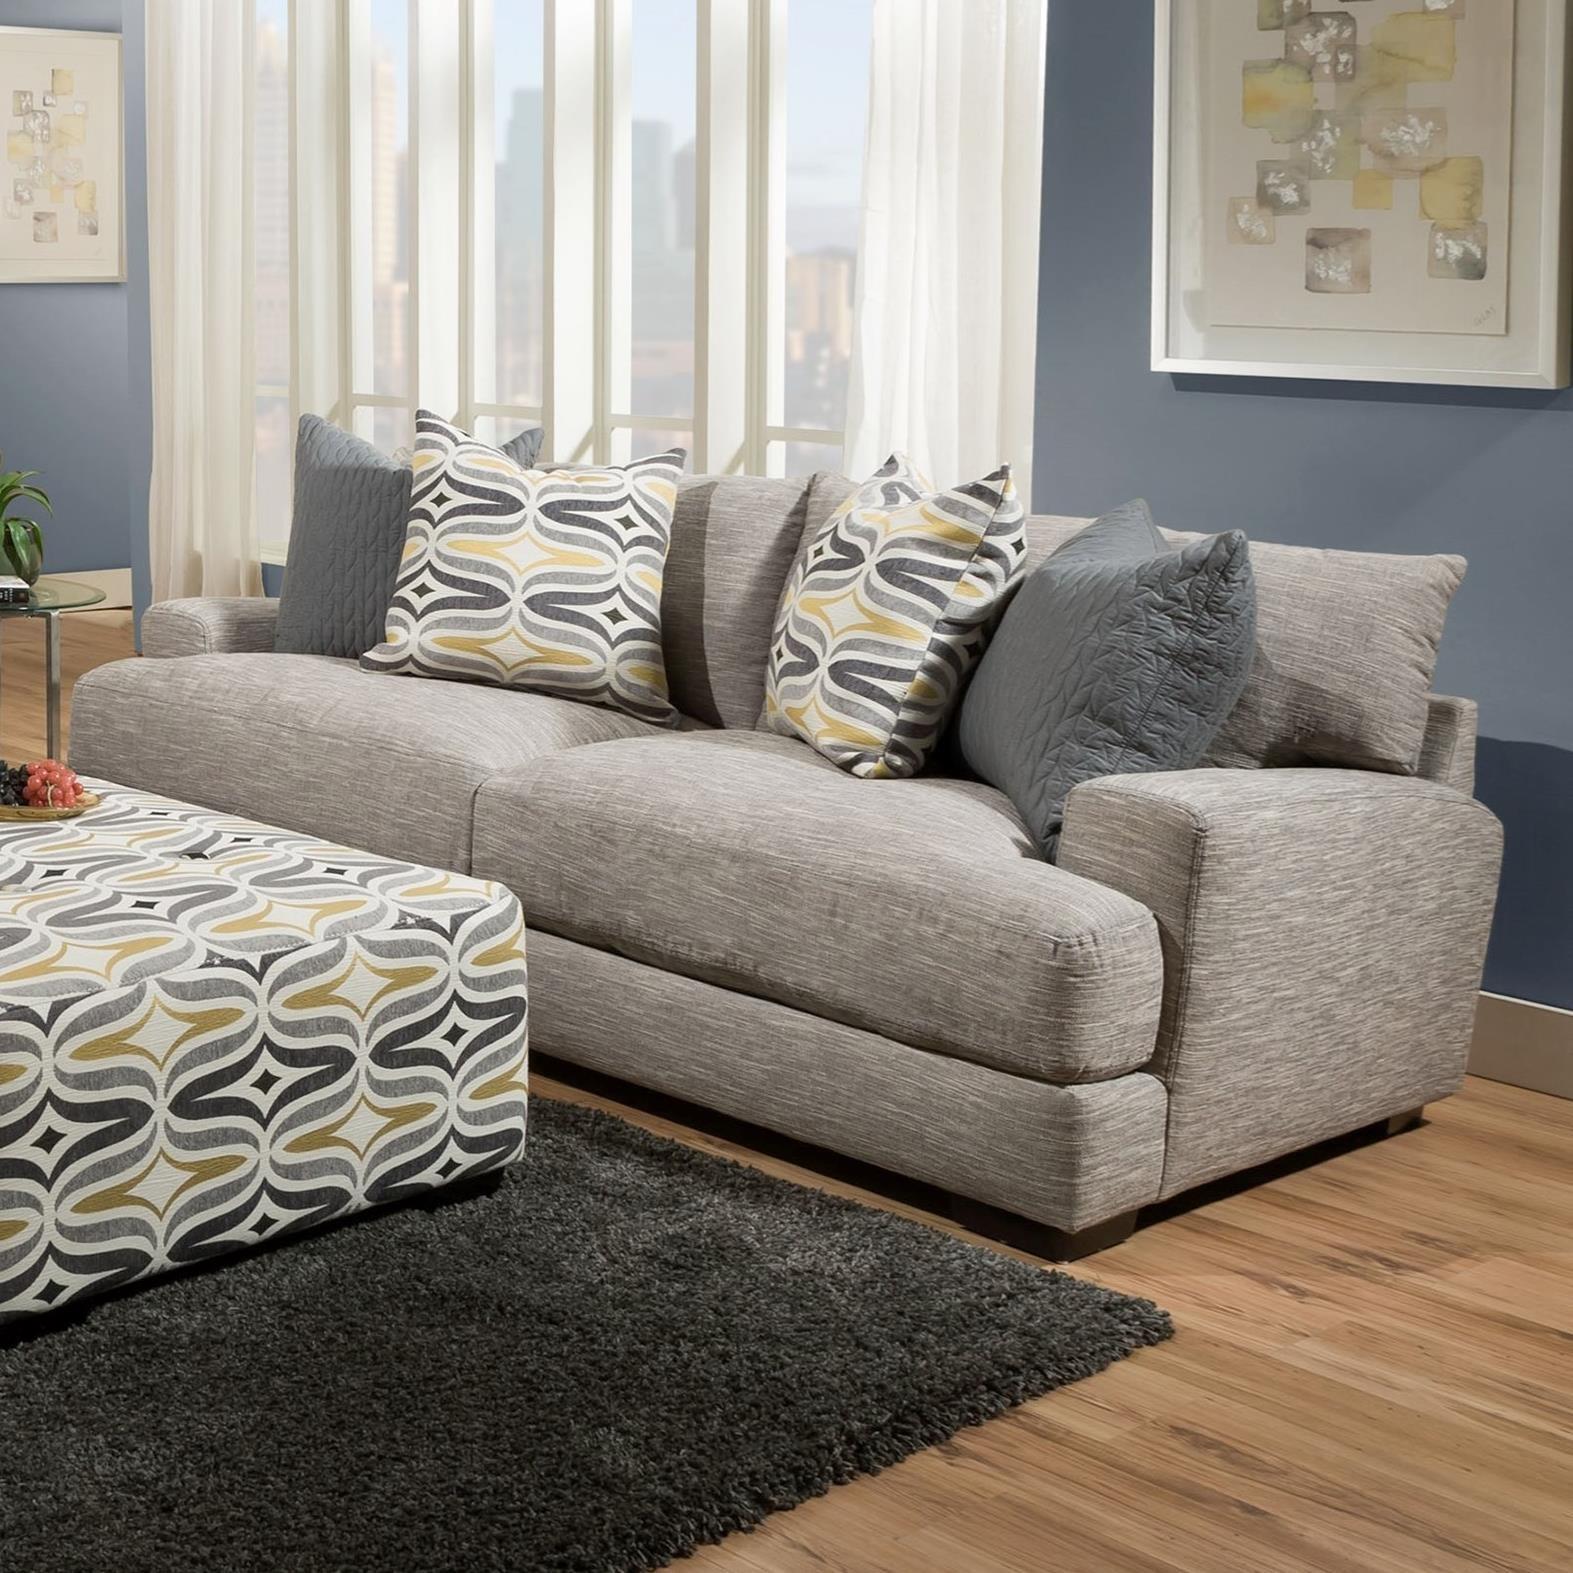 Barton Sofa at Bennett's Furniture and Mattresses